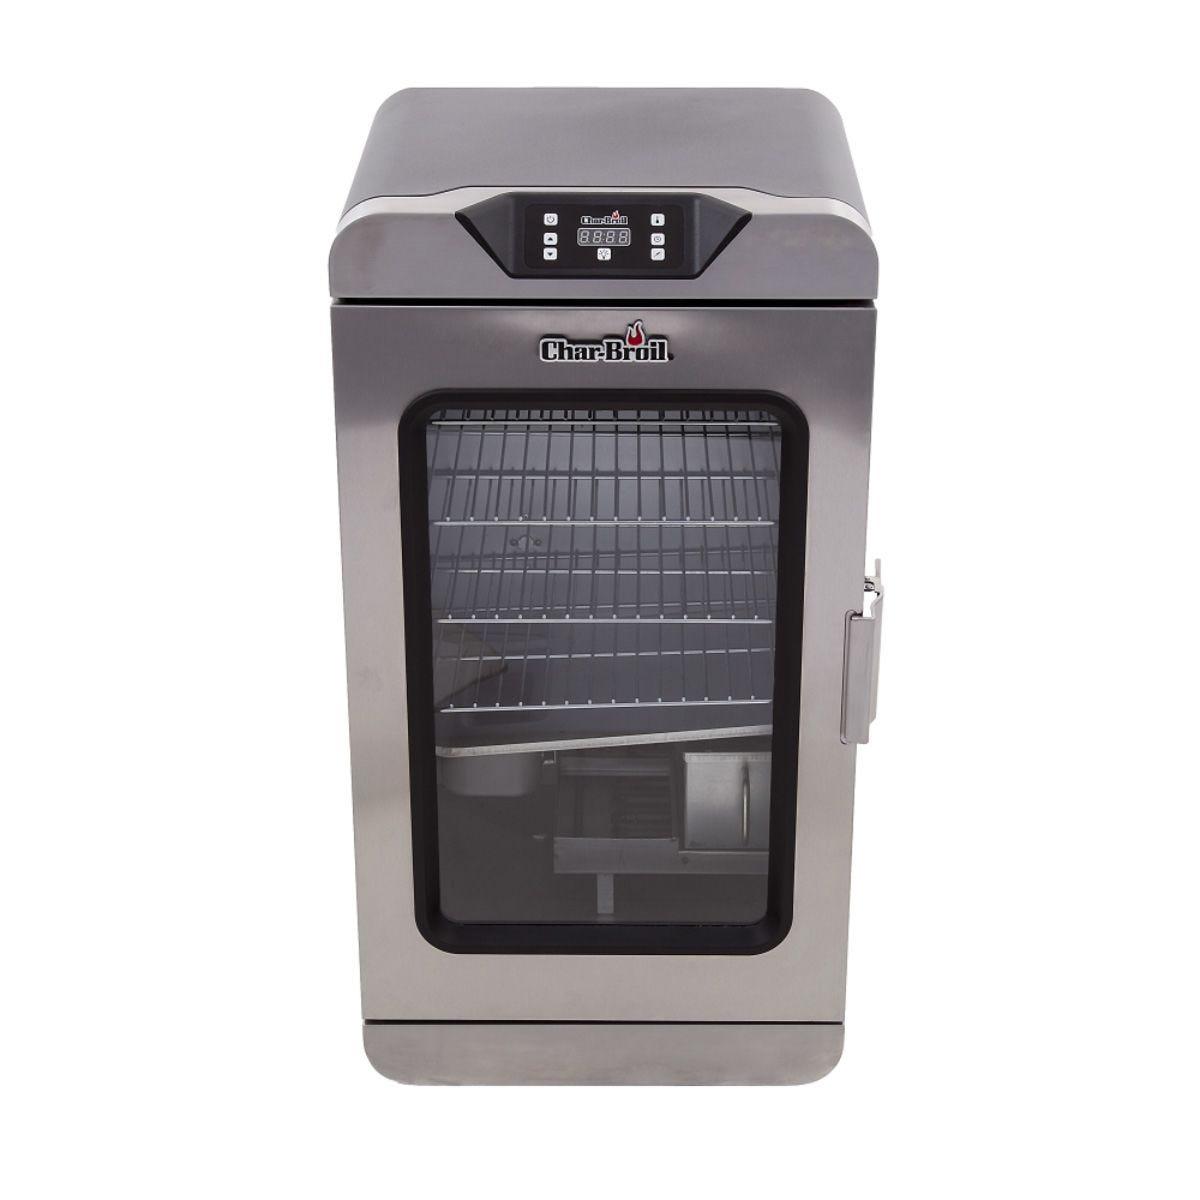 Char-Broil Digital Smoker BBQ - Stainless Steel